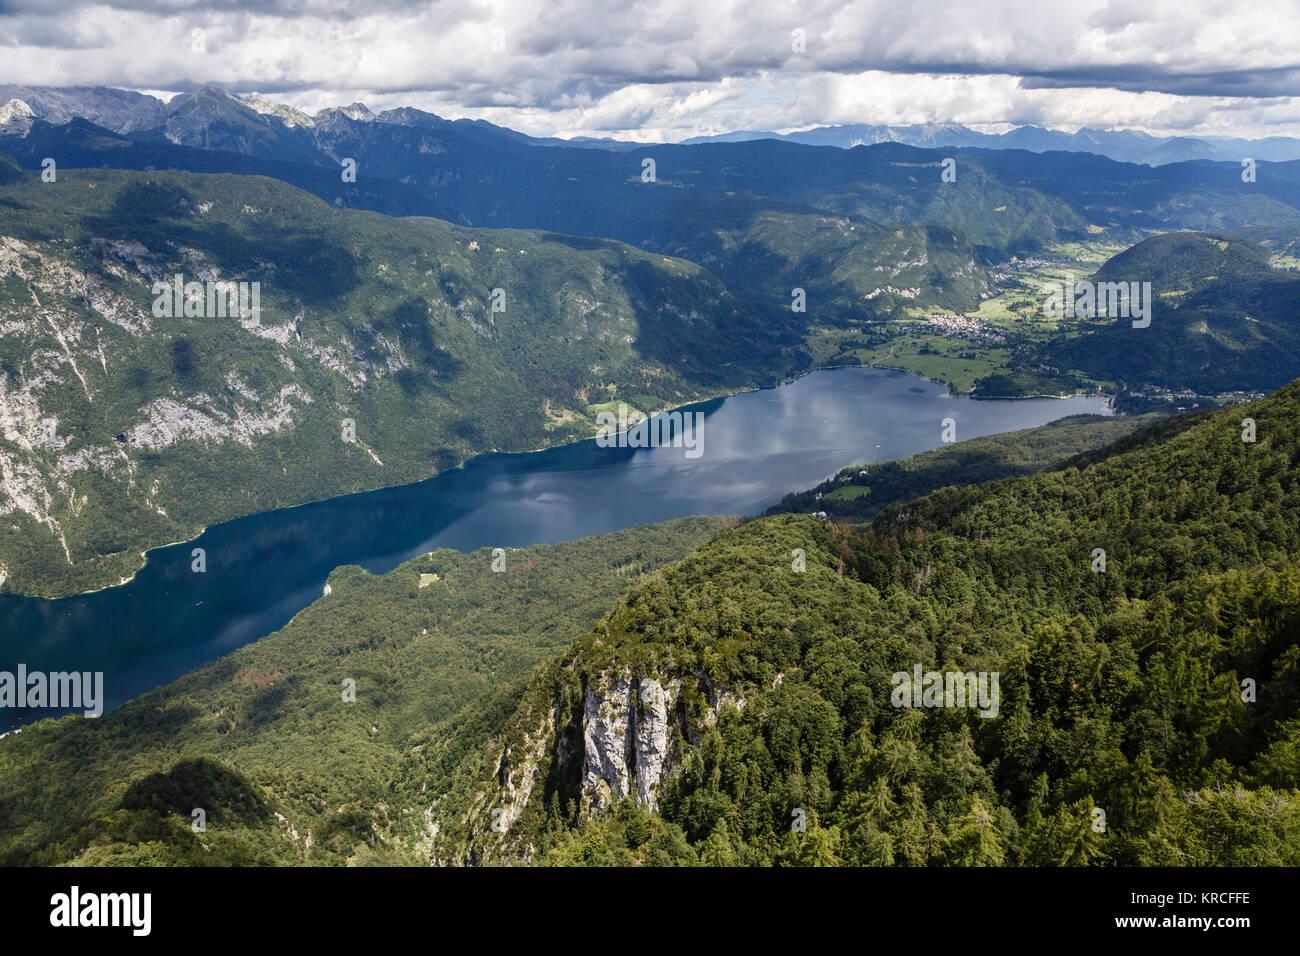 Lake Bohinj from the Vogel mountain, Triglav National Park, Slovenia - Stock Image